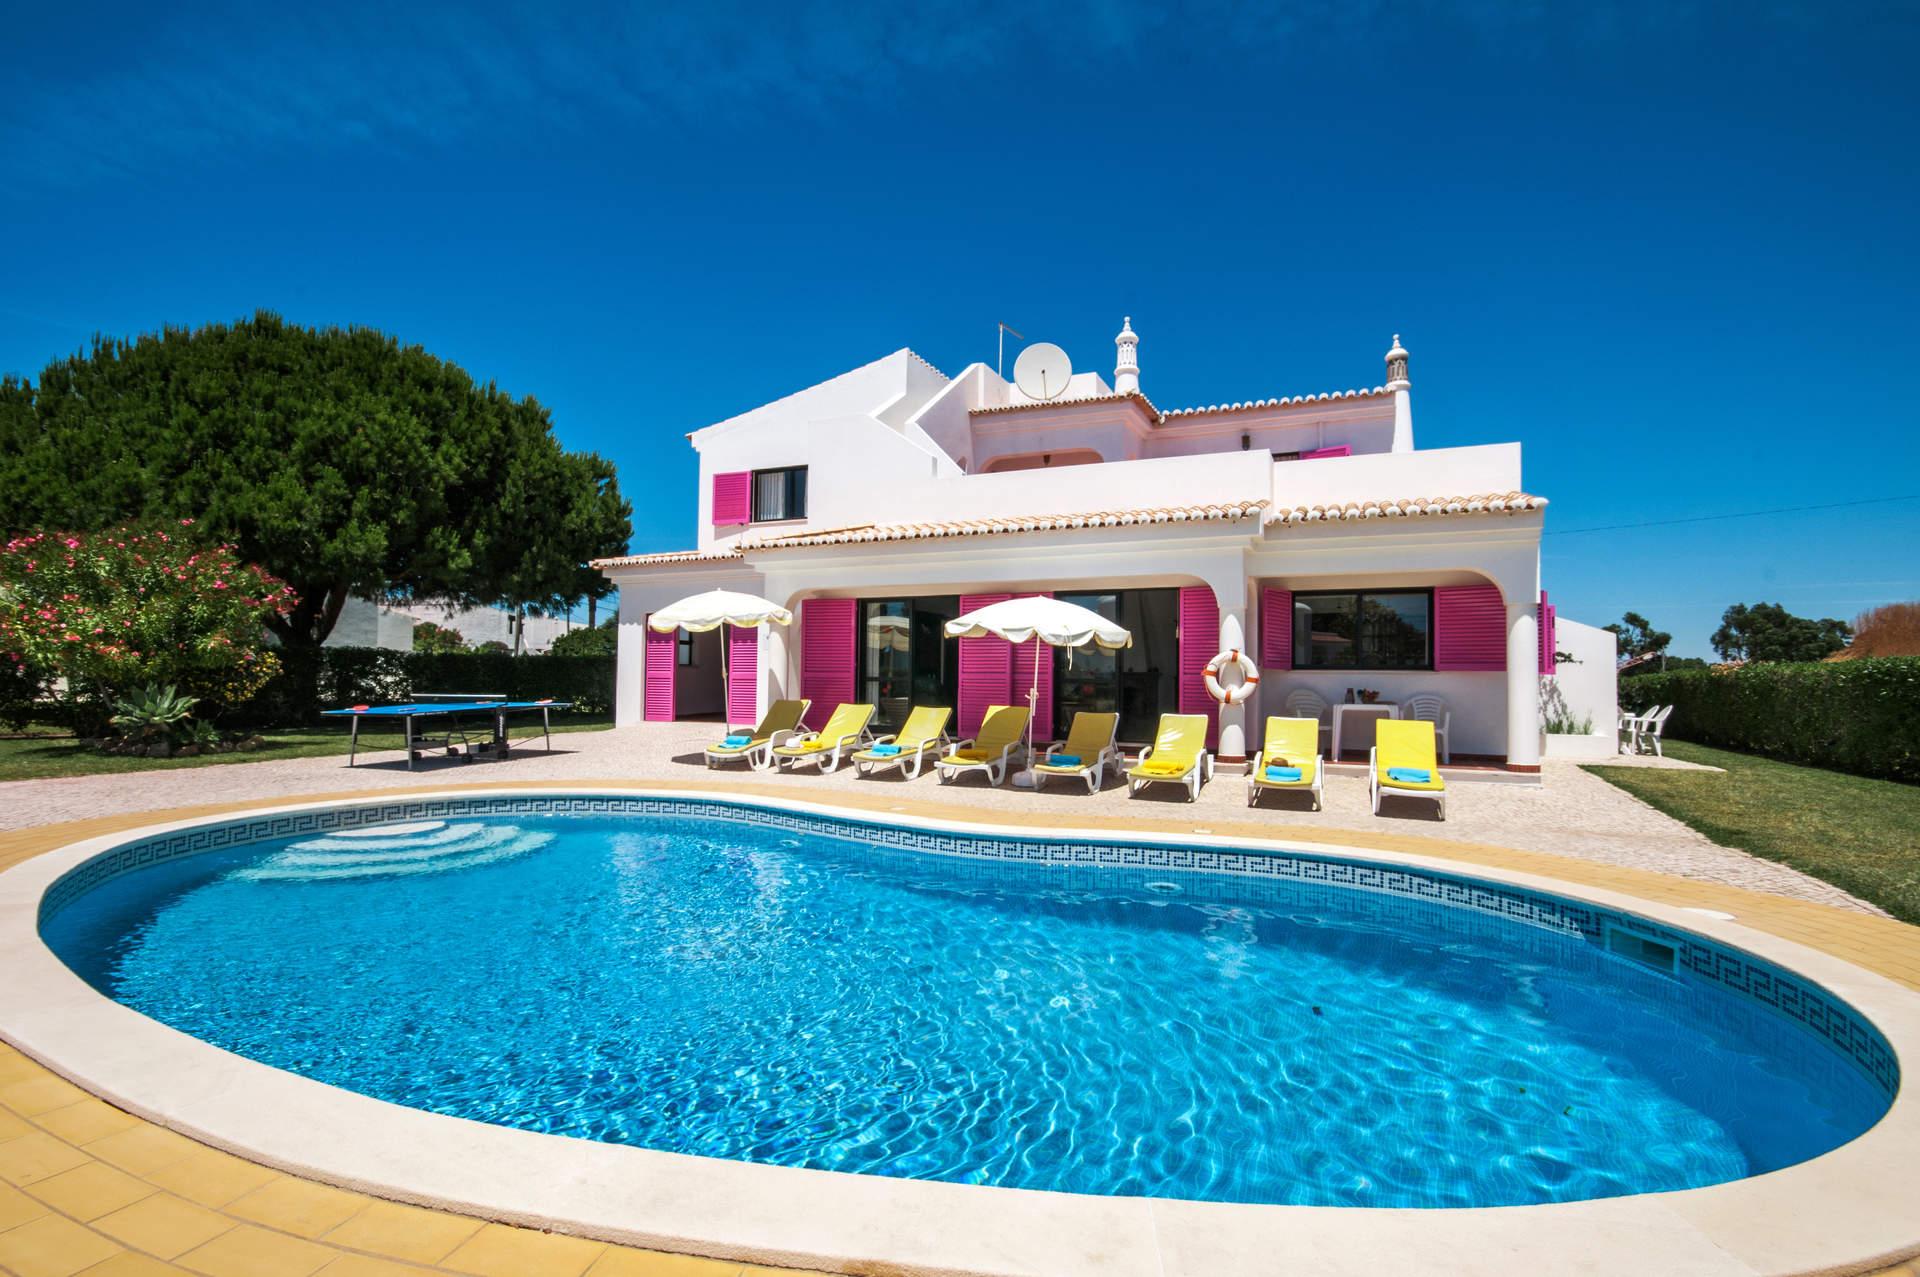 Villa Sousa, Armacao de Pera, Algarve, Portugal